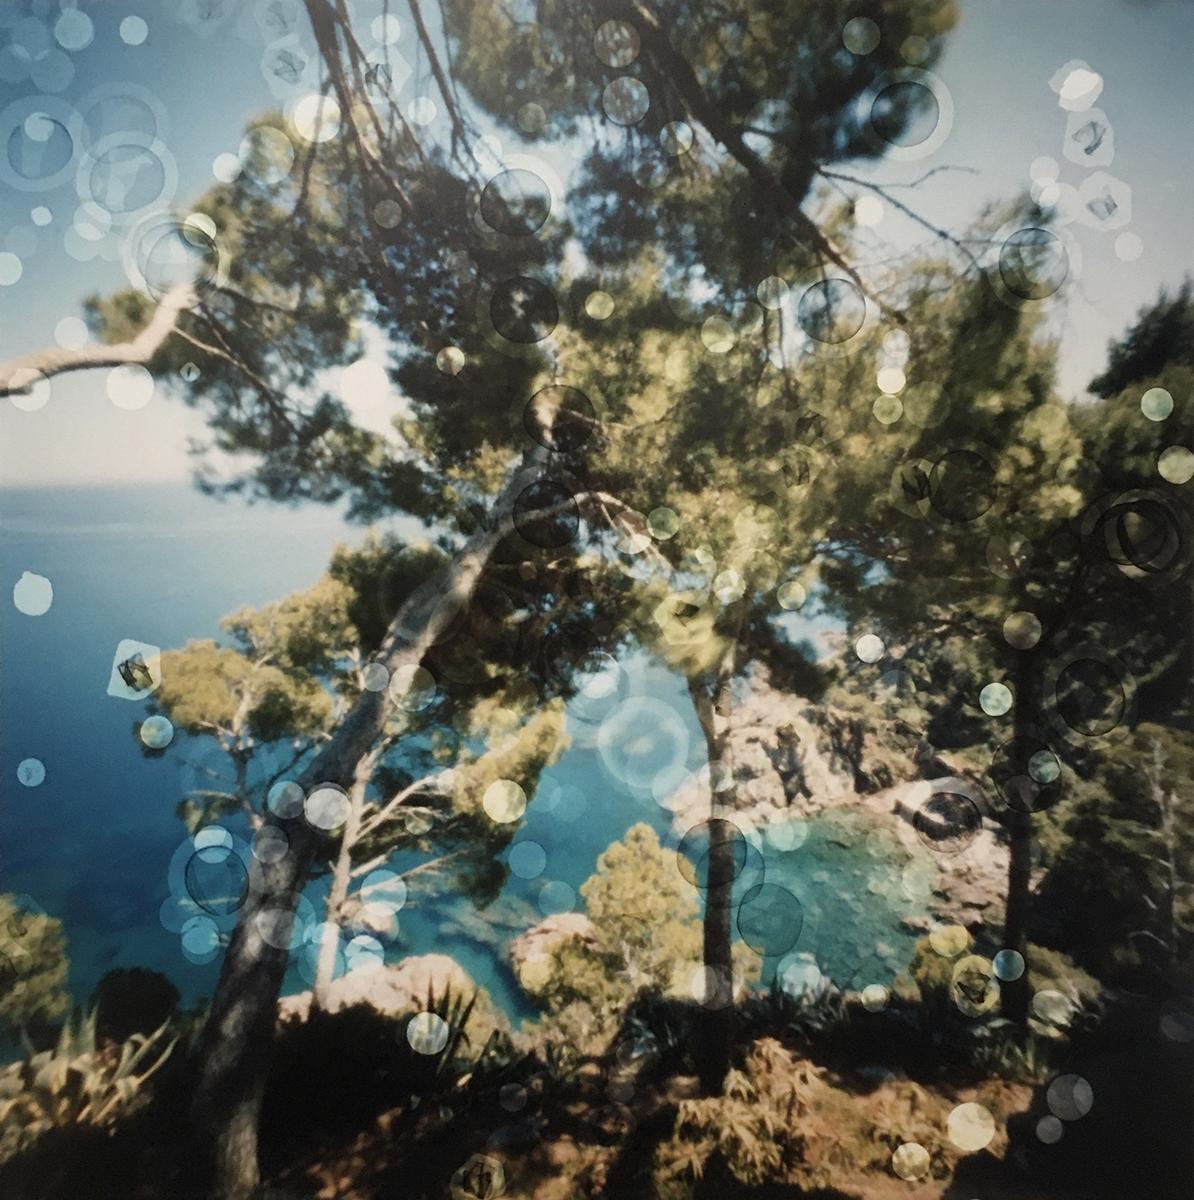 Jardi Botanic de Cap Roig, Spain (sea view) (2019)